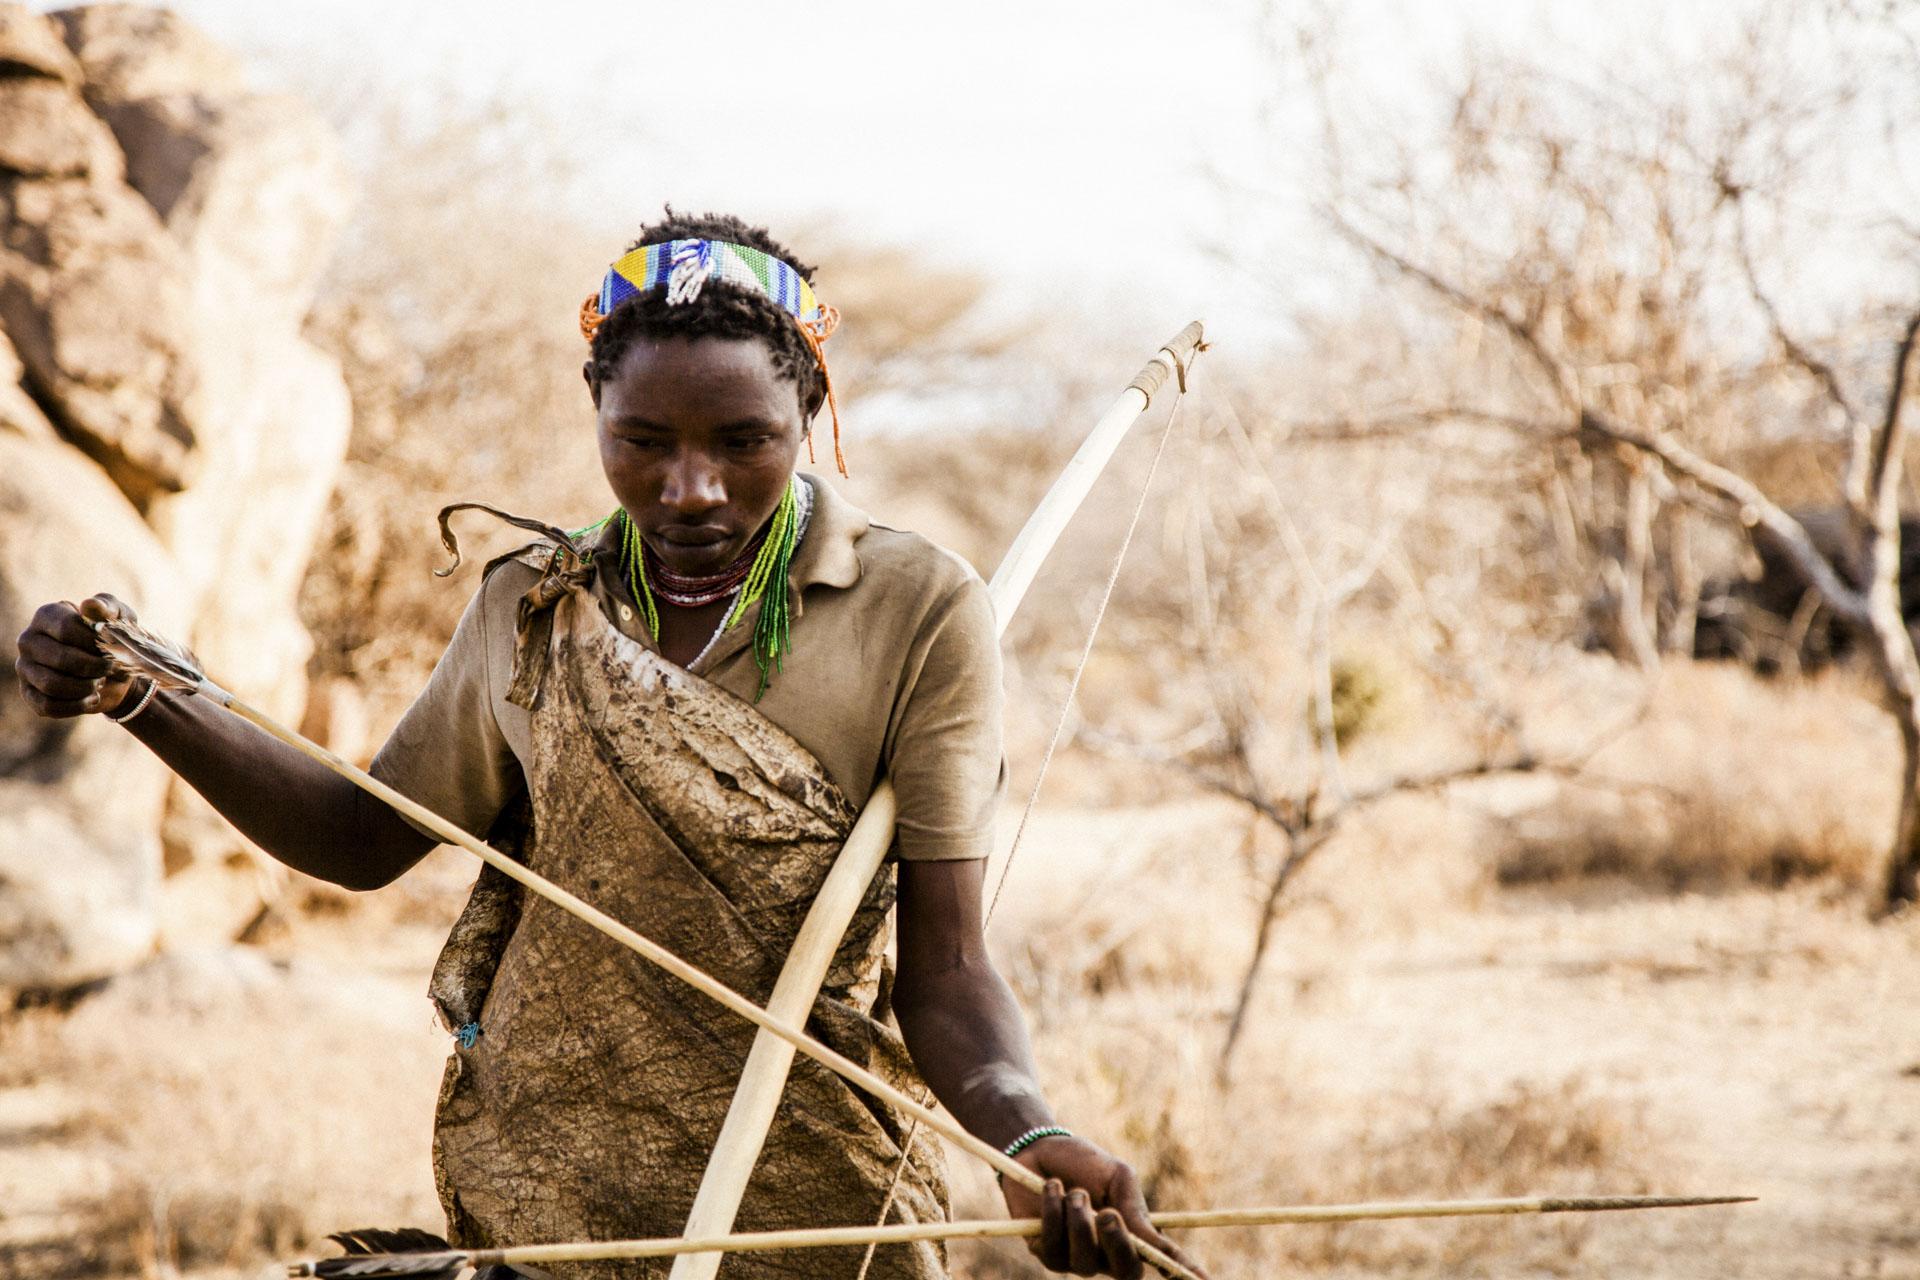 Dokumentarfotografie Tansania Afrika, Documentary photography Tanzania Africa